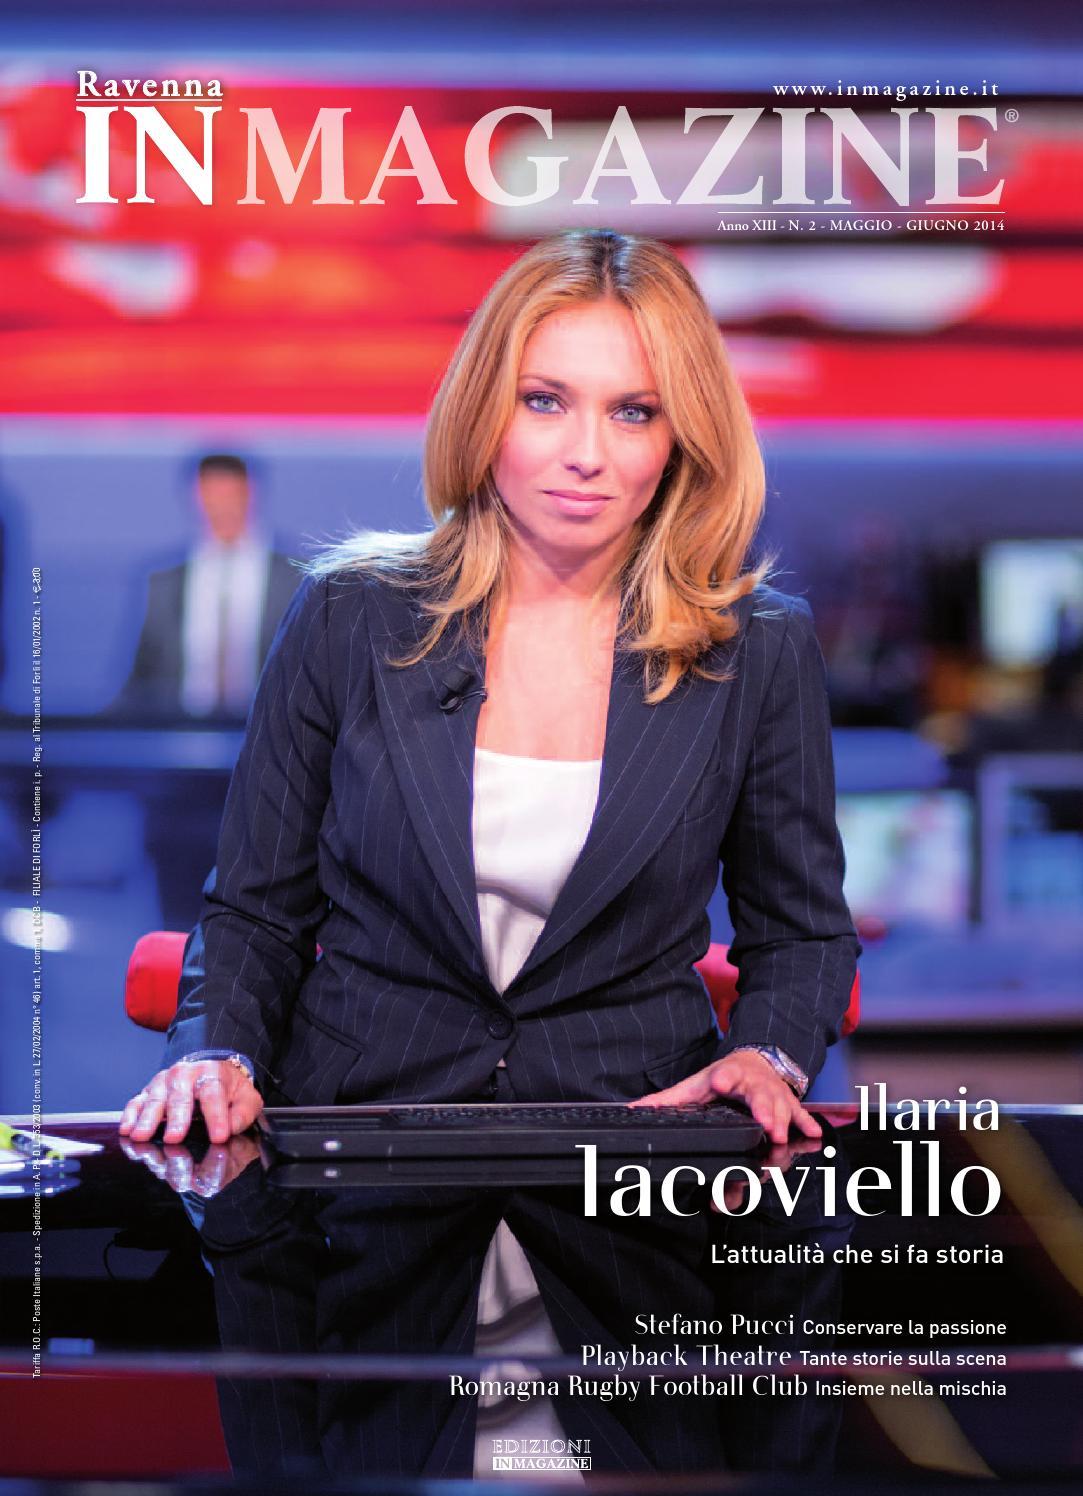 Ravenna IN Magazine – 02 2014 by Edizioni IN Magazine srl - issuu 9daf524e0be